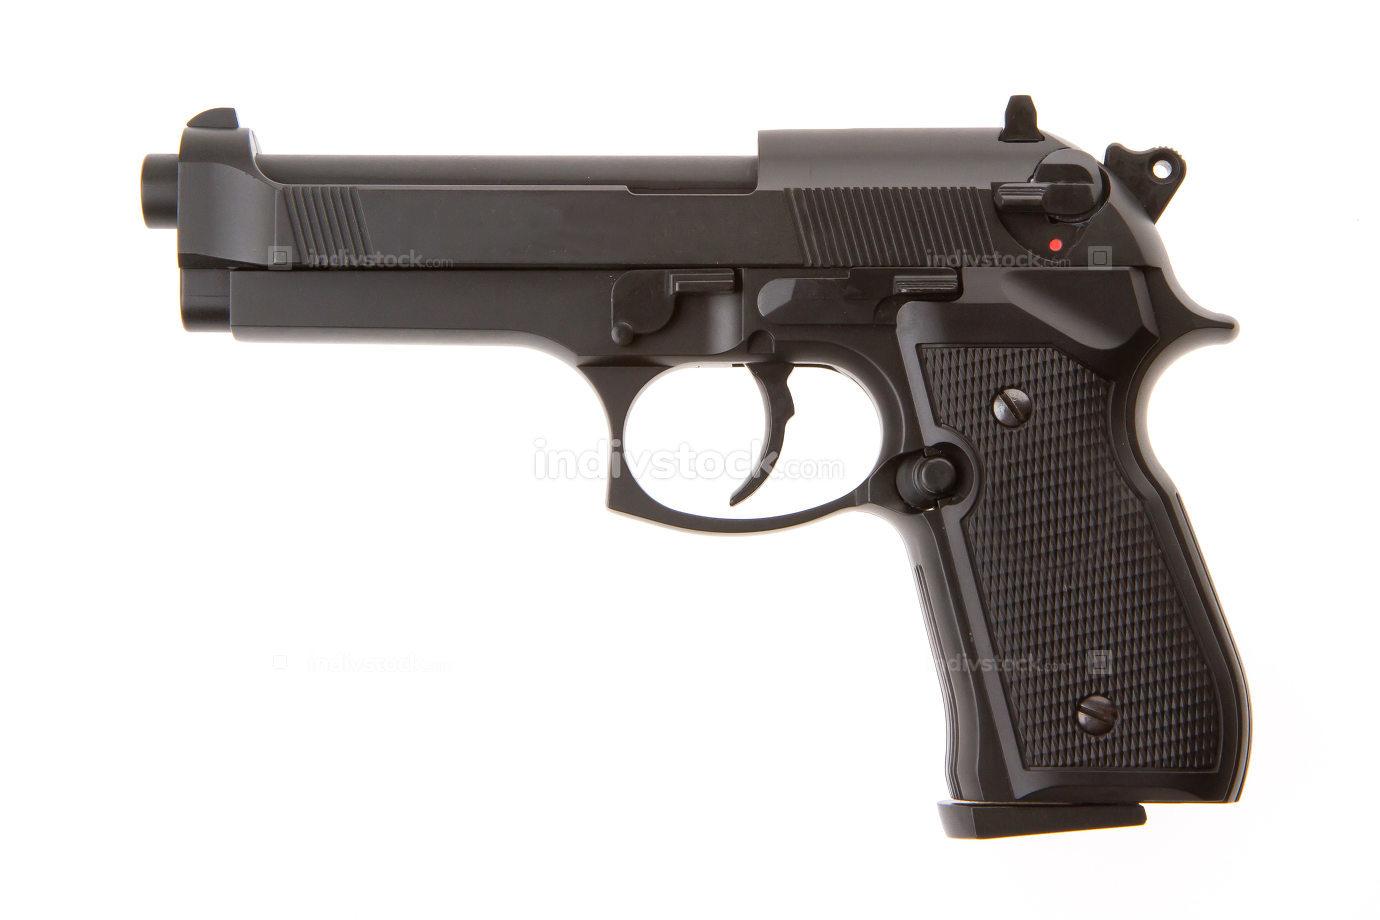 Semi-automatic gun isolated